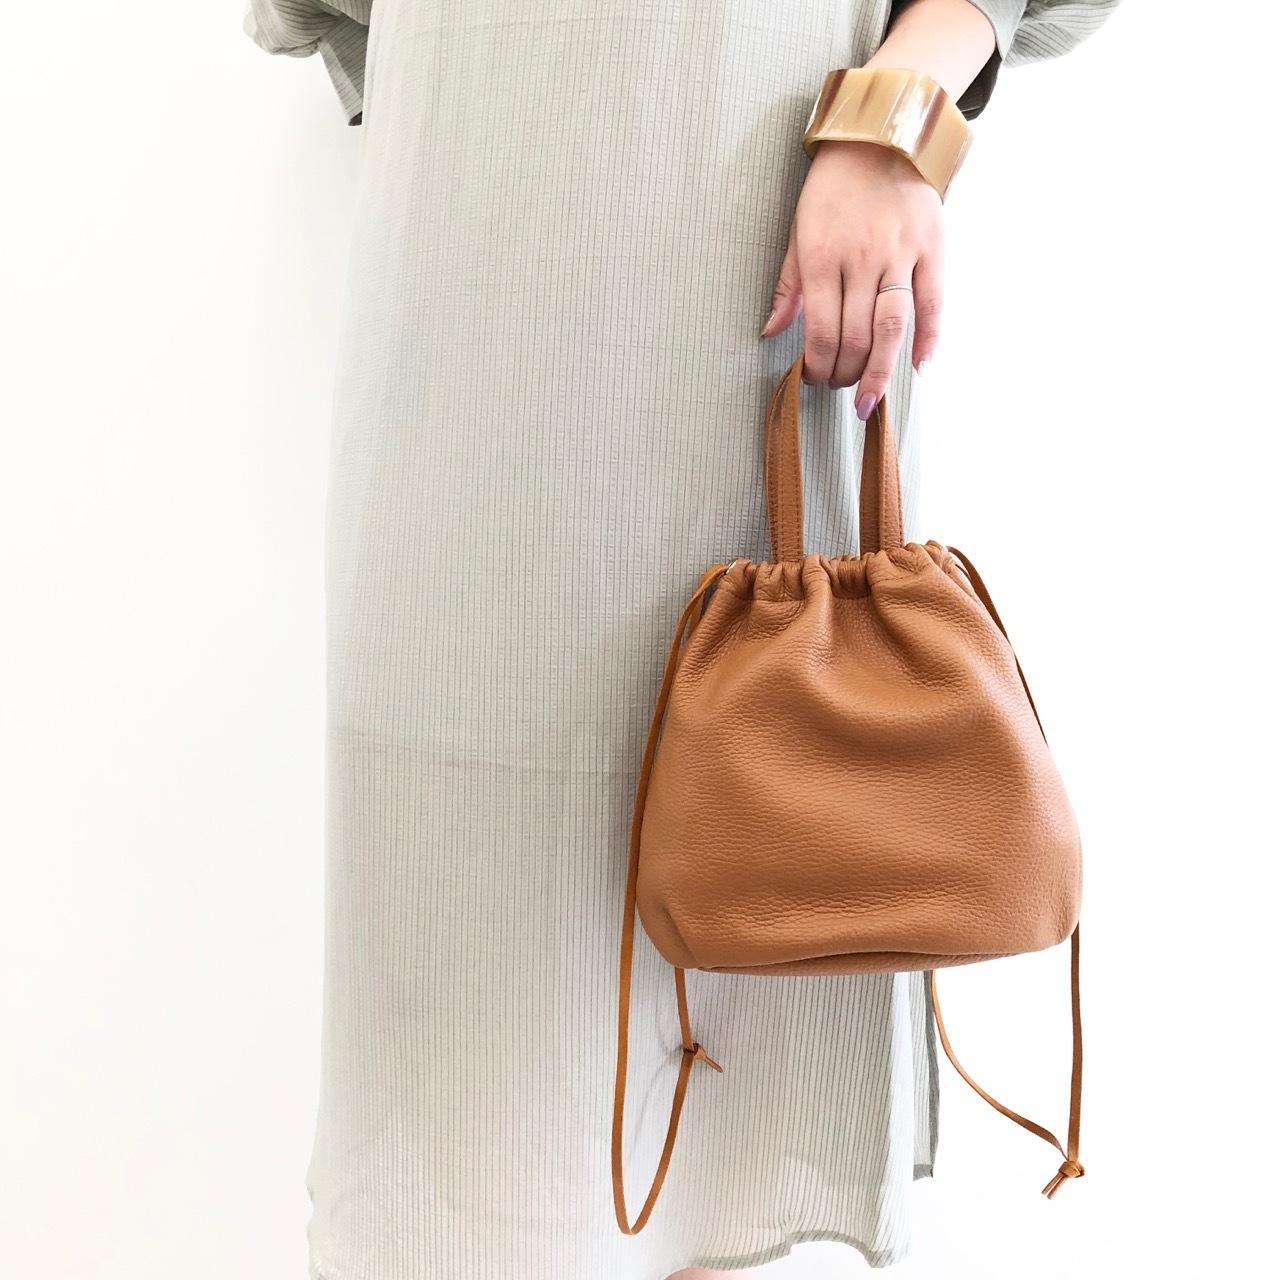 【 joe&him 】- JO-AC9301 - イタリアンレザー巾着バッグ